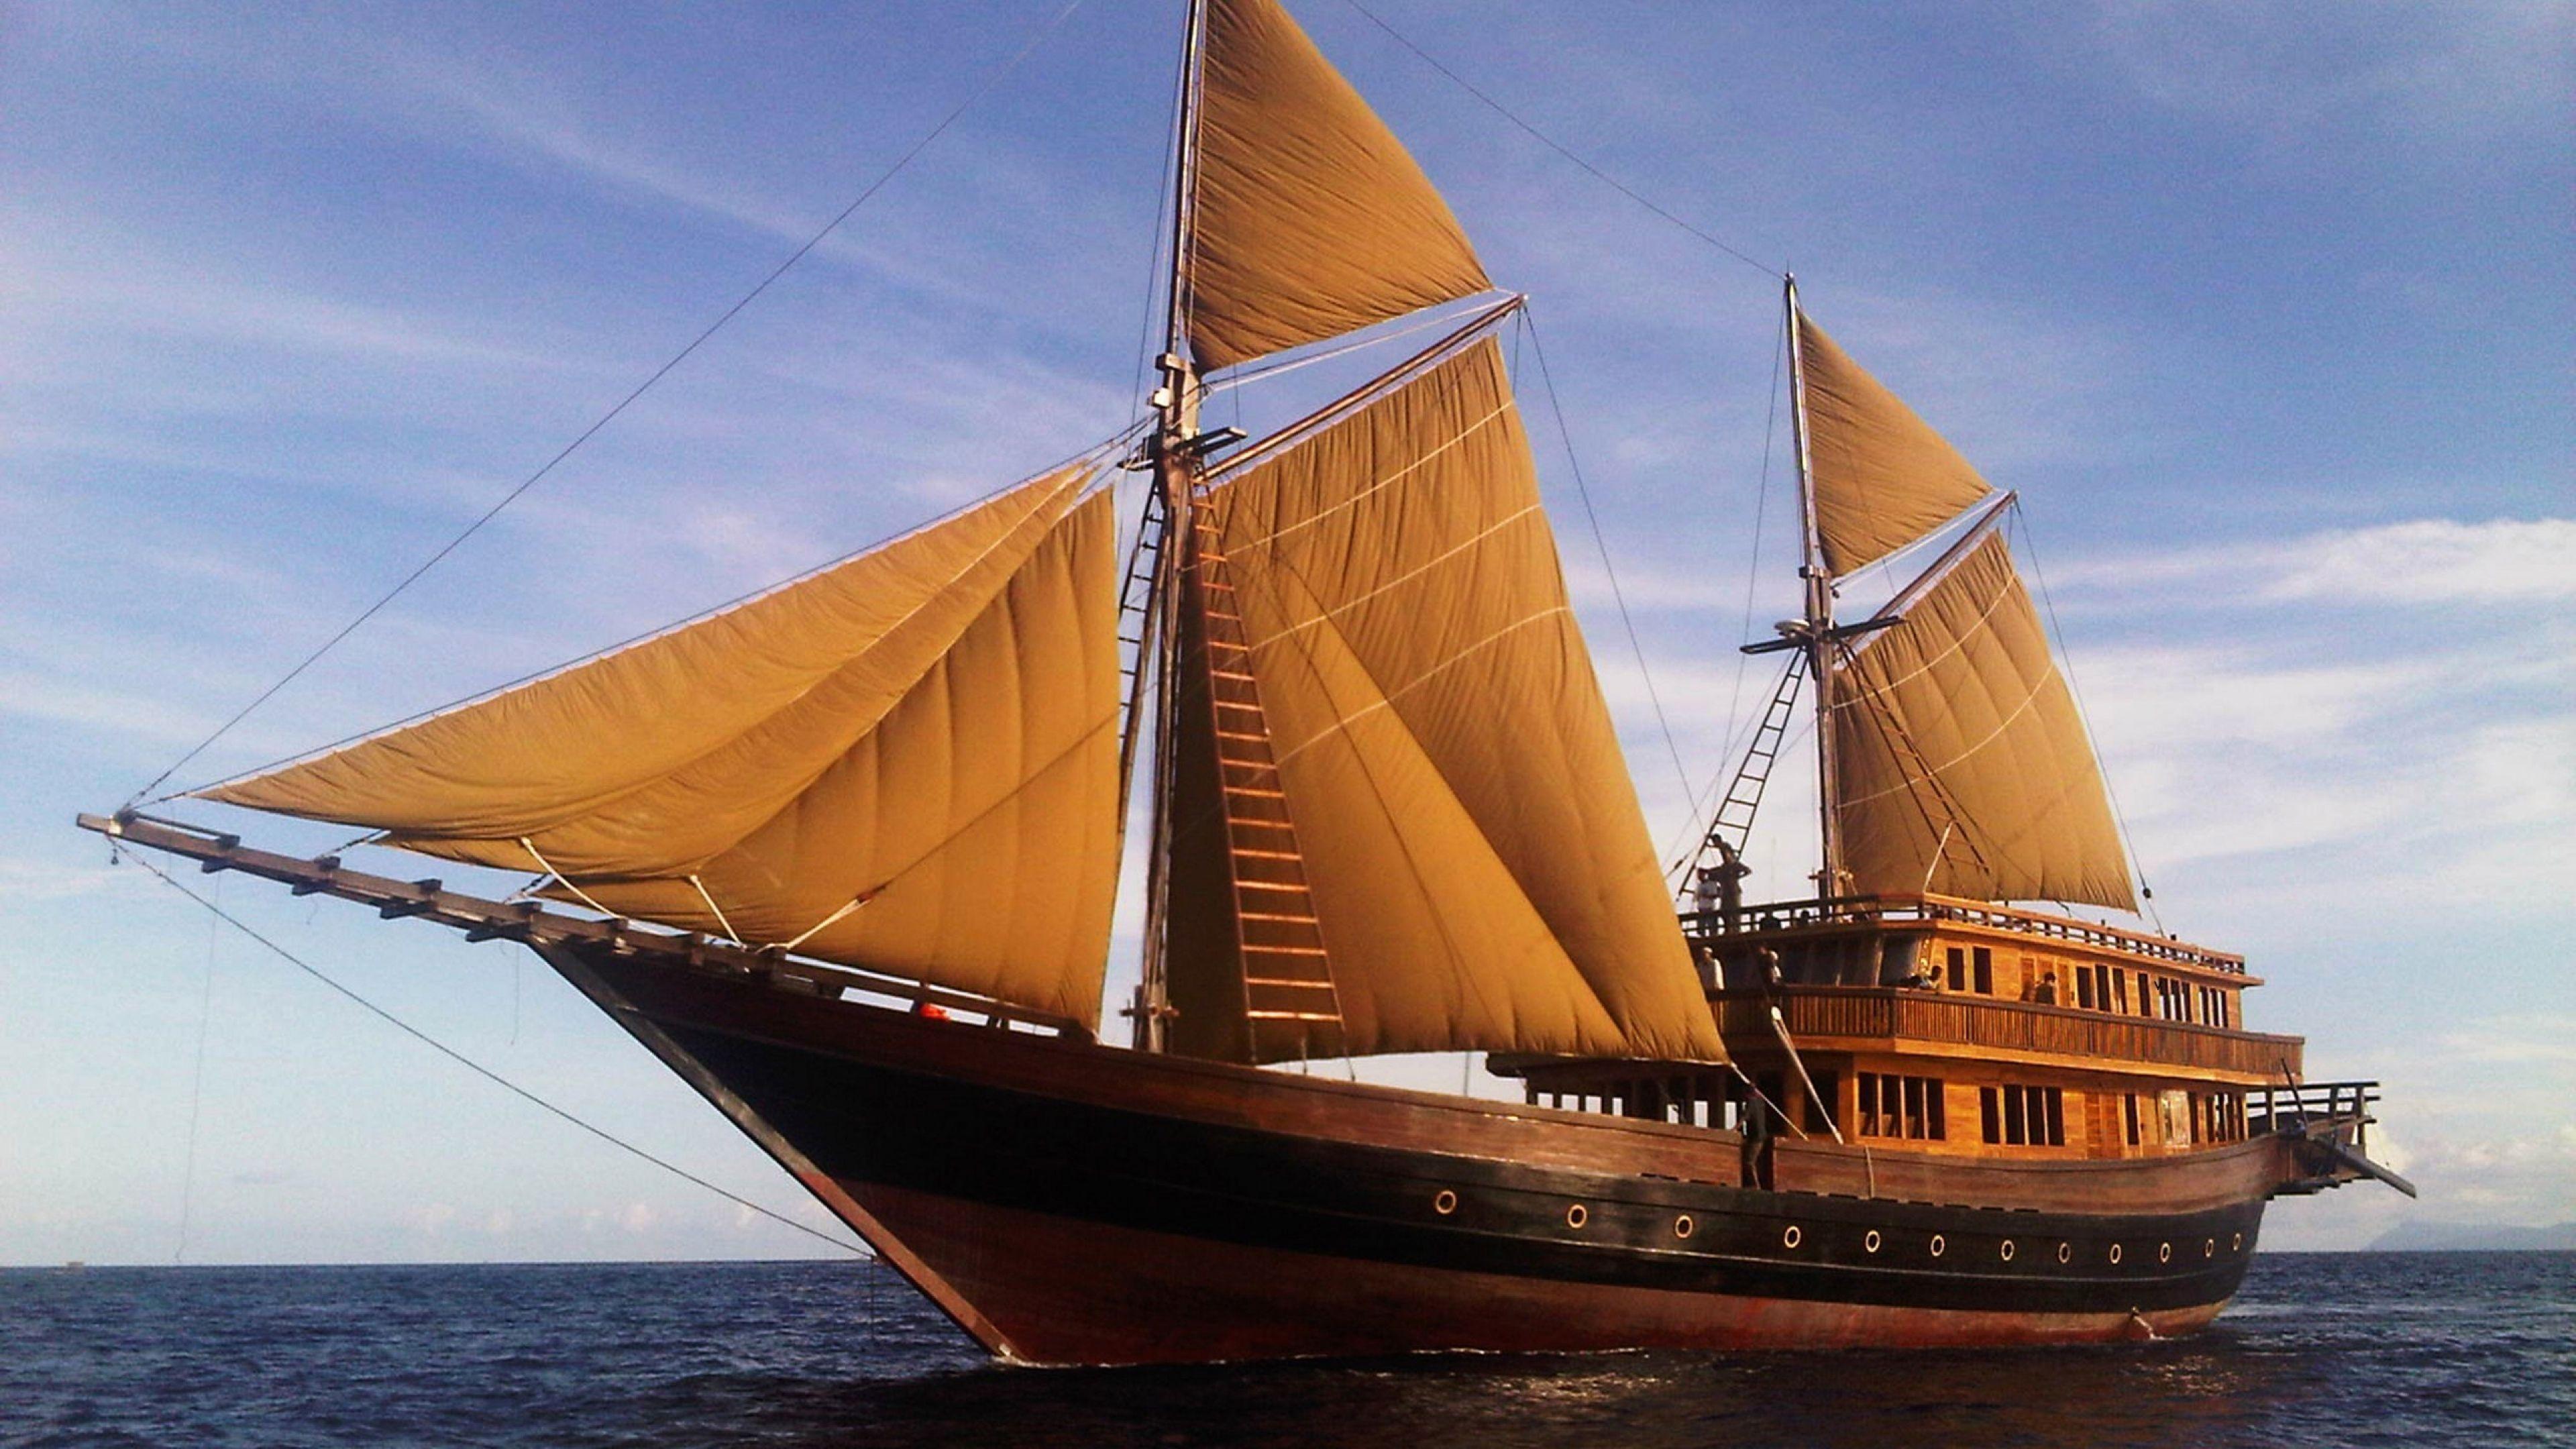 4k Ultra Hd Sail Wallpapers Hd Desktop Backgrounds 3840x2160 Perahu Kapal Komodo